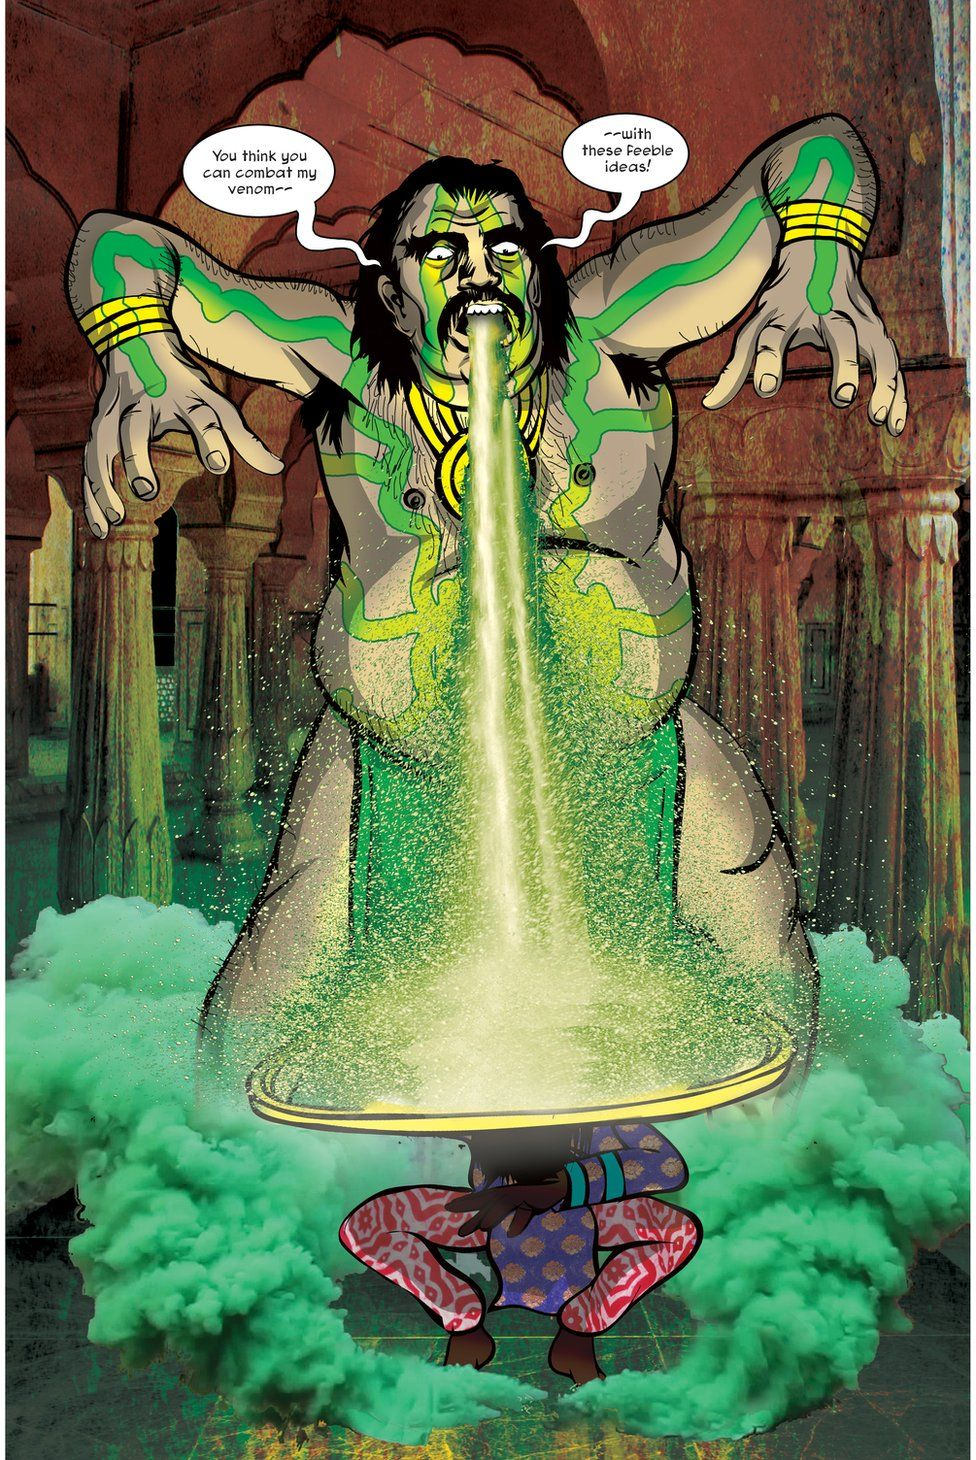 Ahankar the villain